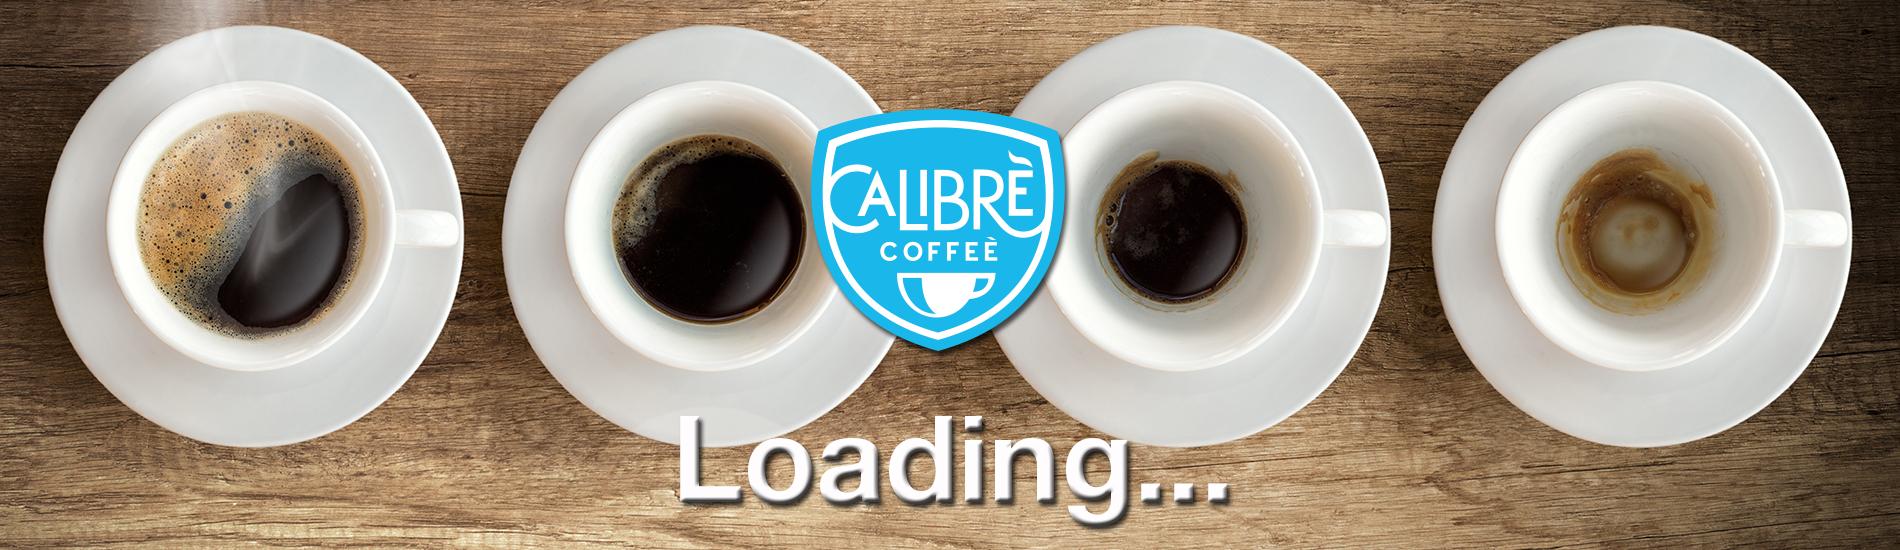 Calibre-coffee-loading3